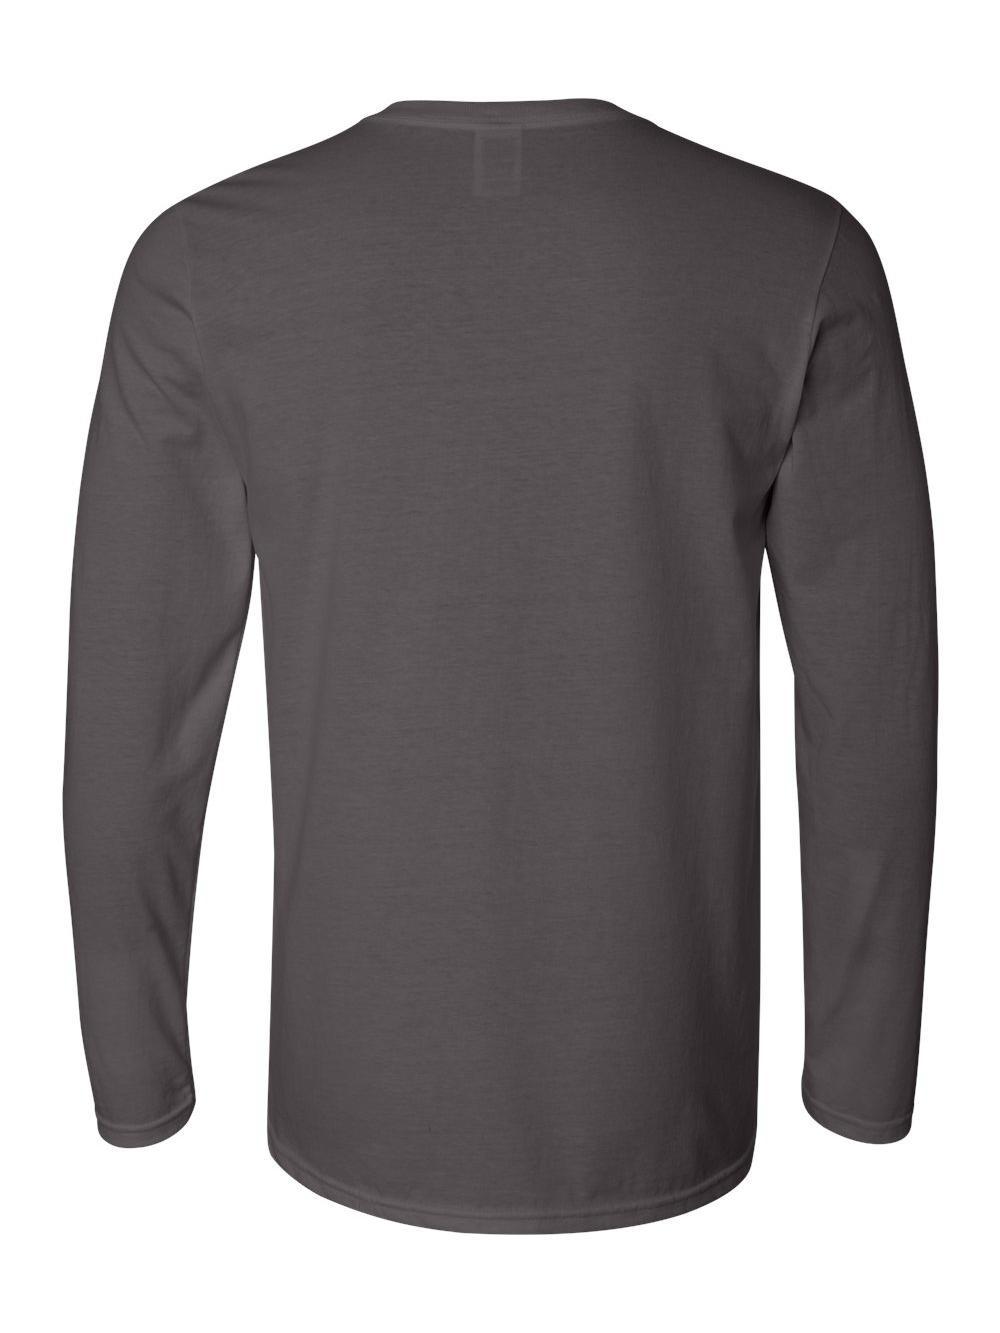 Gildan-Softstyle-Long-Sleeve-T-Shirt-64400 thumbnail 7